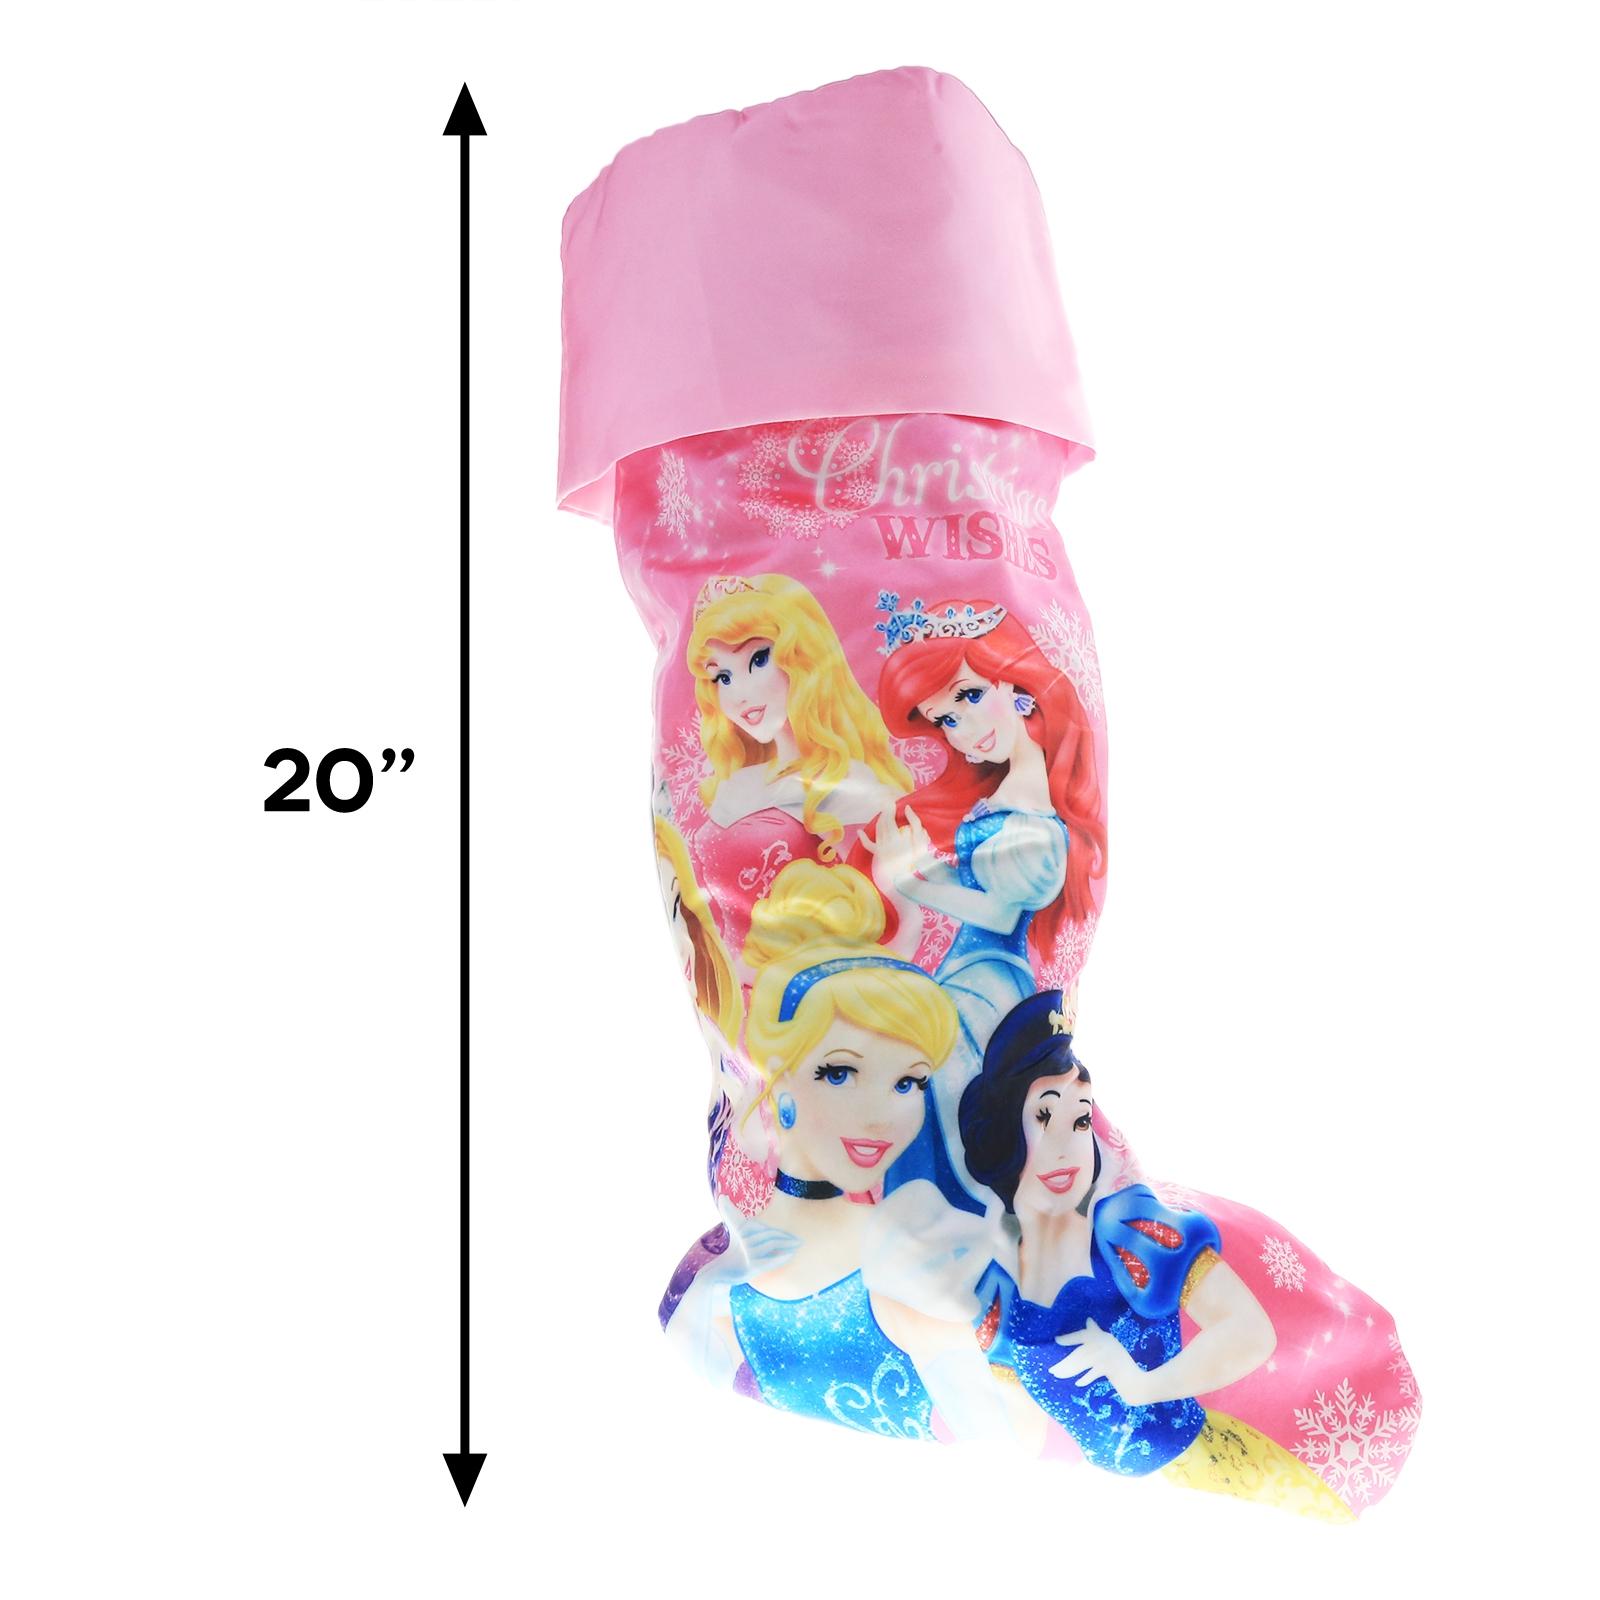 Disney Princess 20 Inch Girls Holiday Stocking Satin Print Pink Kids Home Decor